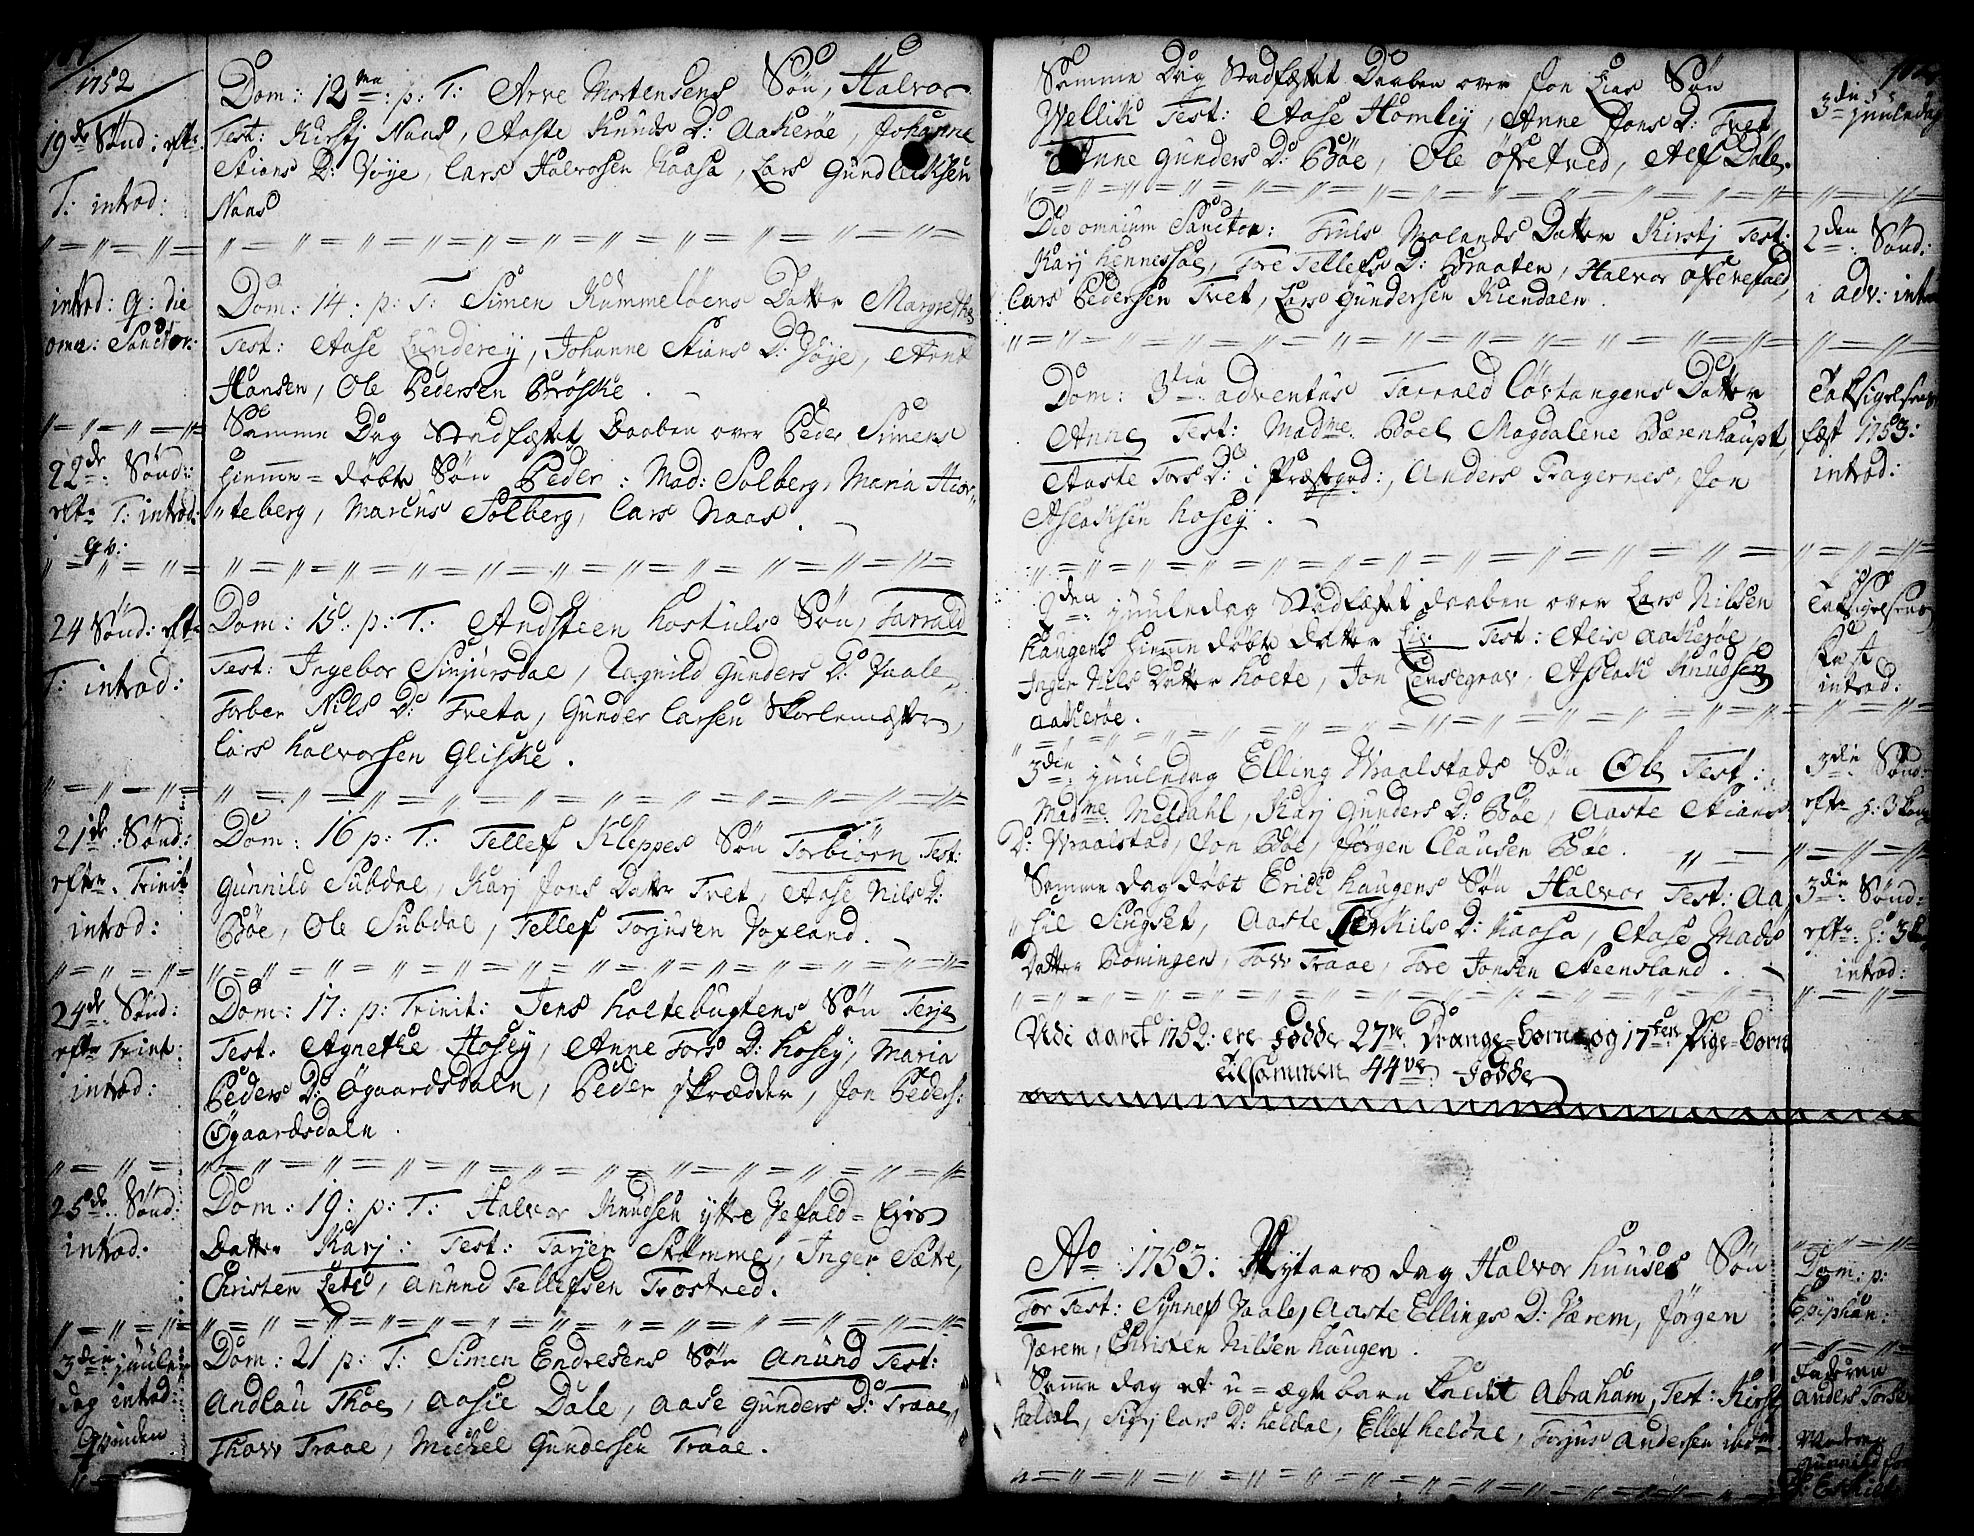 SAKO, Drangedal kirkebøker, F/Fa/L0002: Ministerialbok nr. 2, 1733-1753, s. 101-102